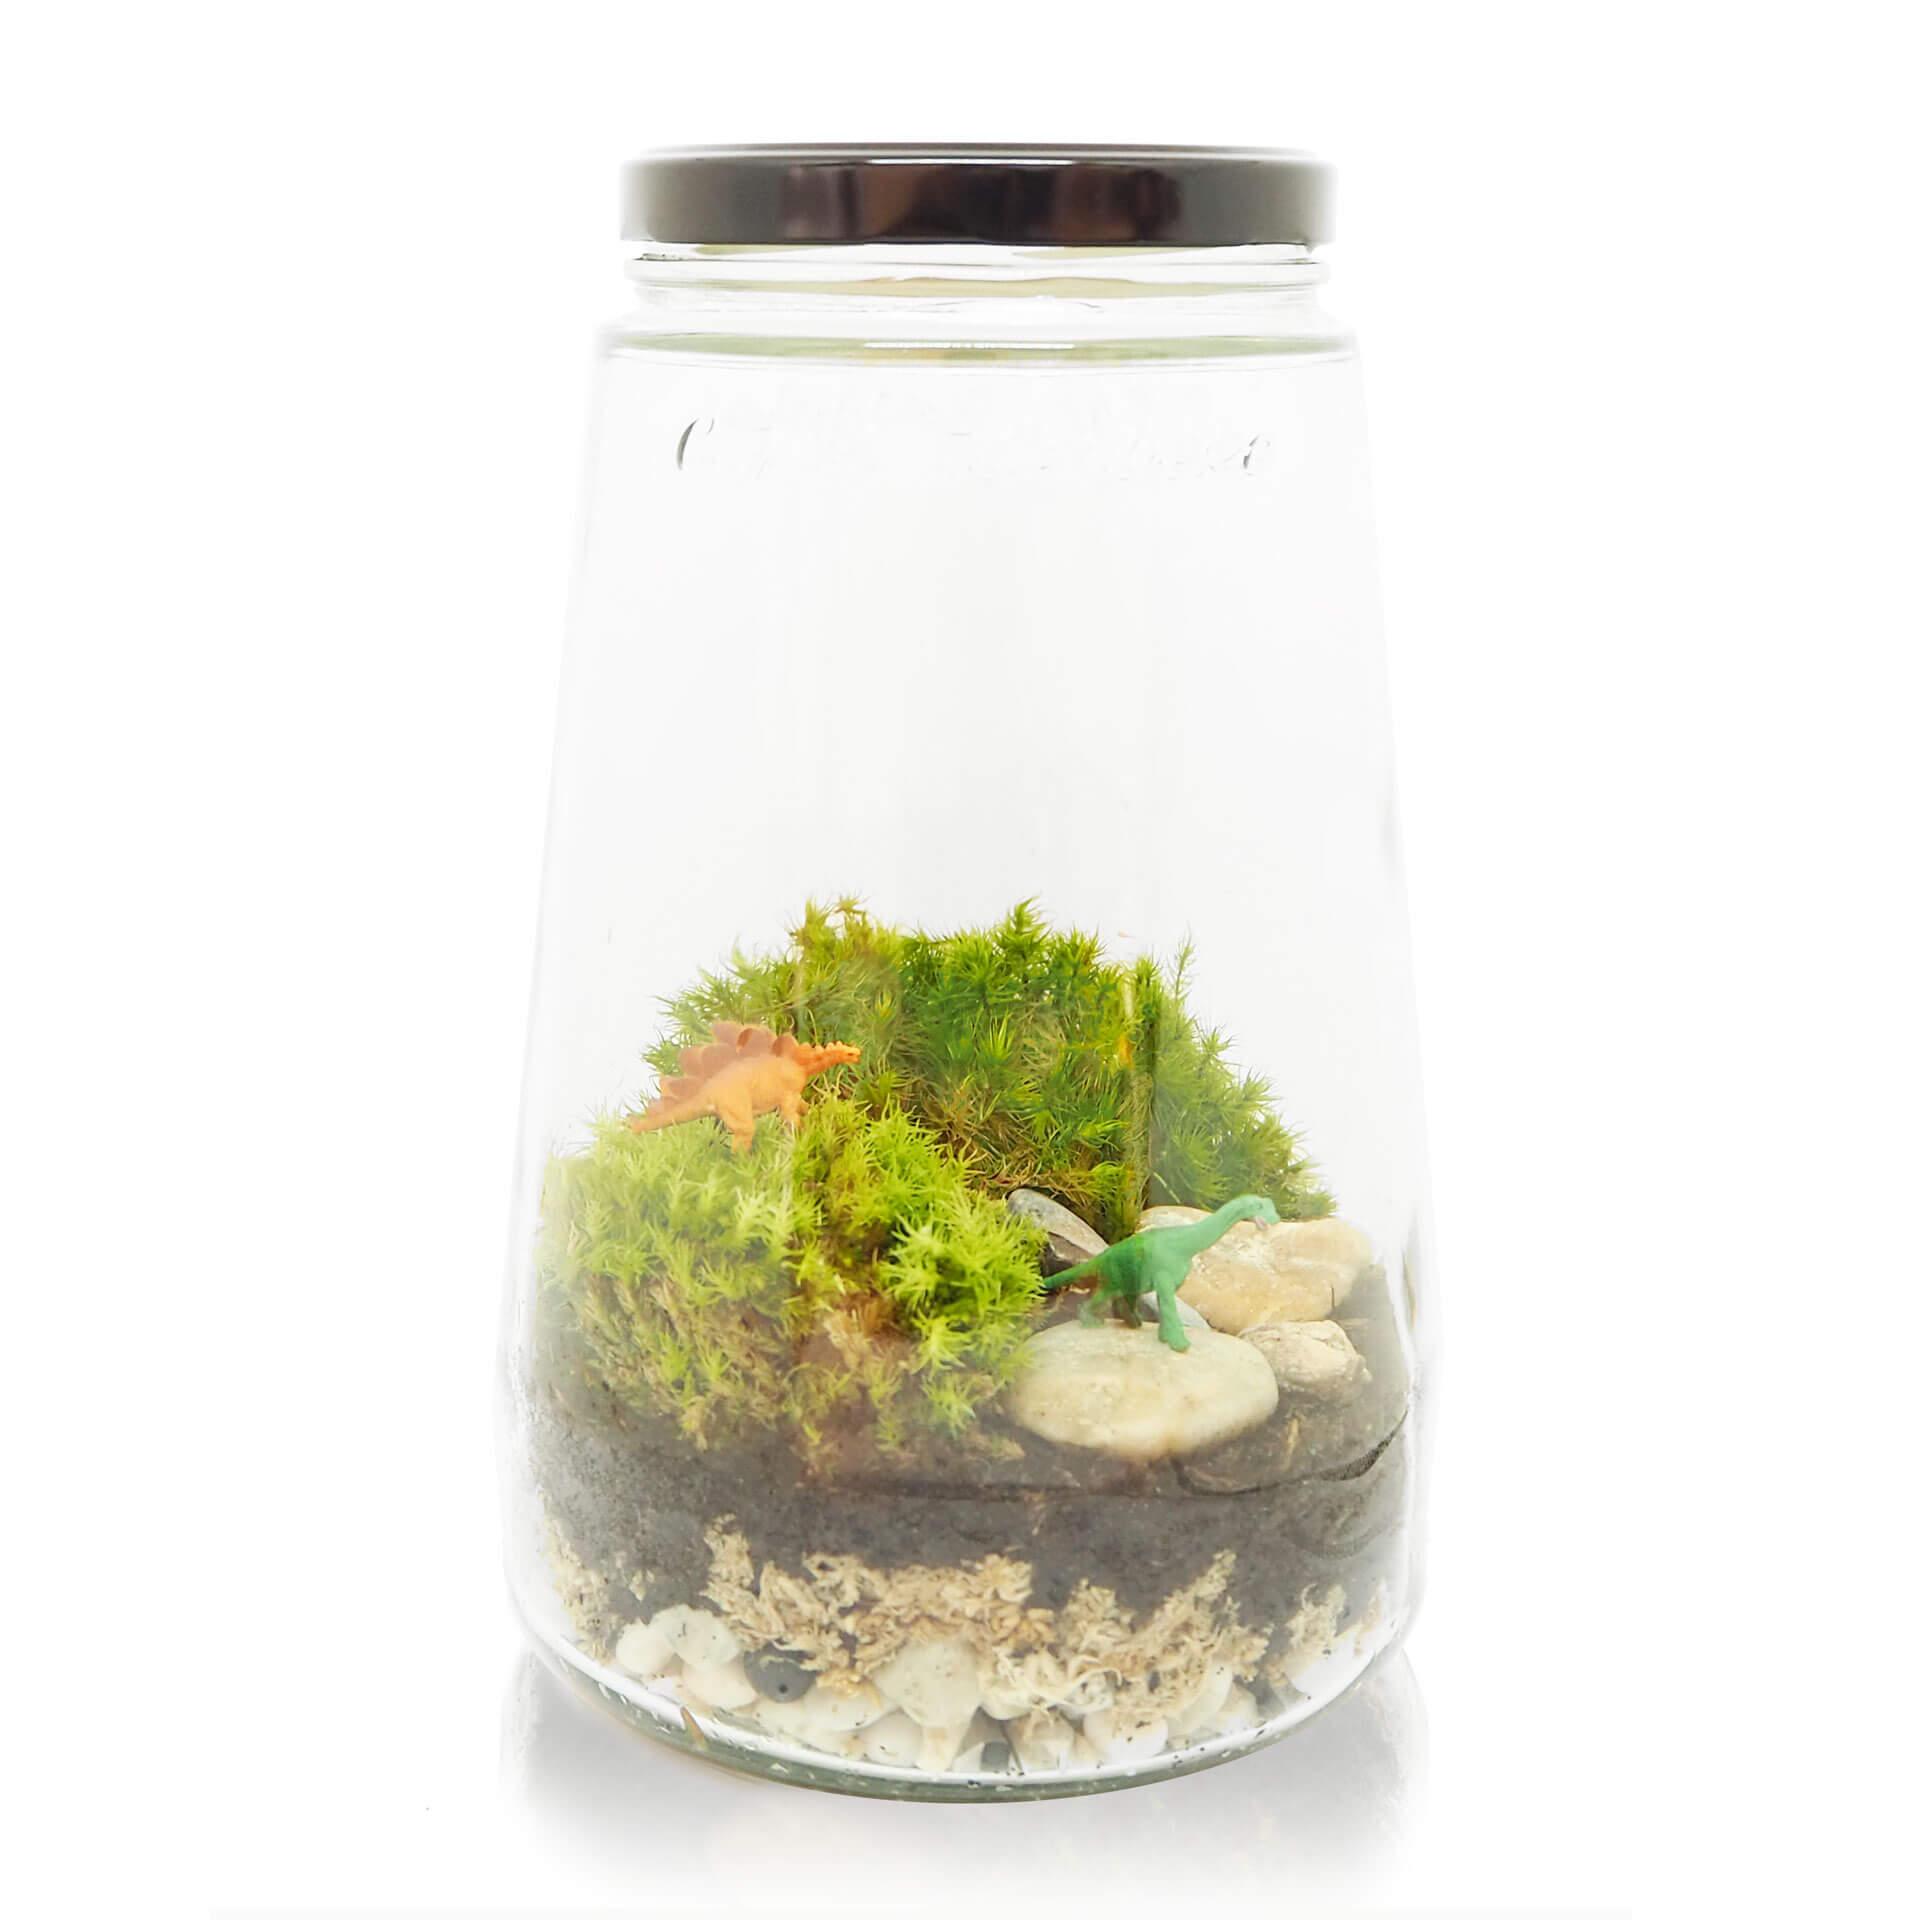 dino ecosysteem terrarium miniscape dino diy kit